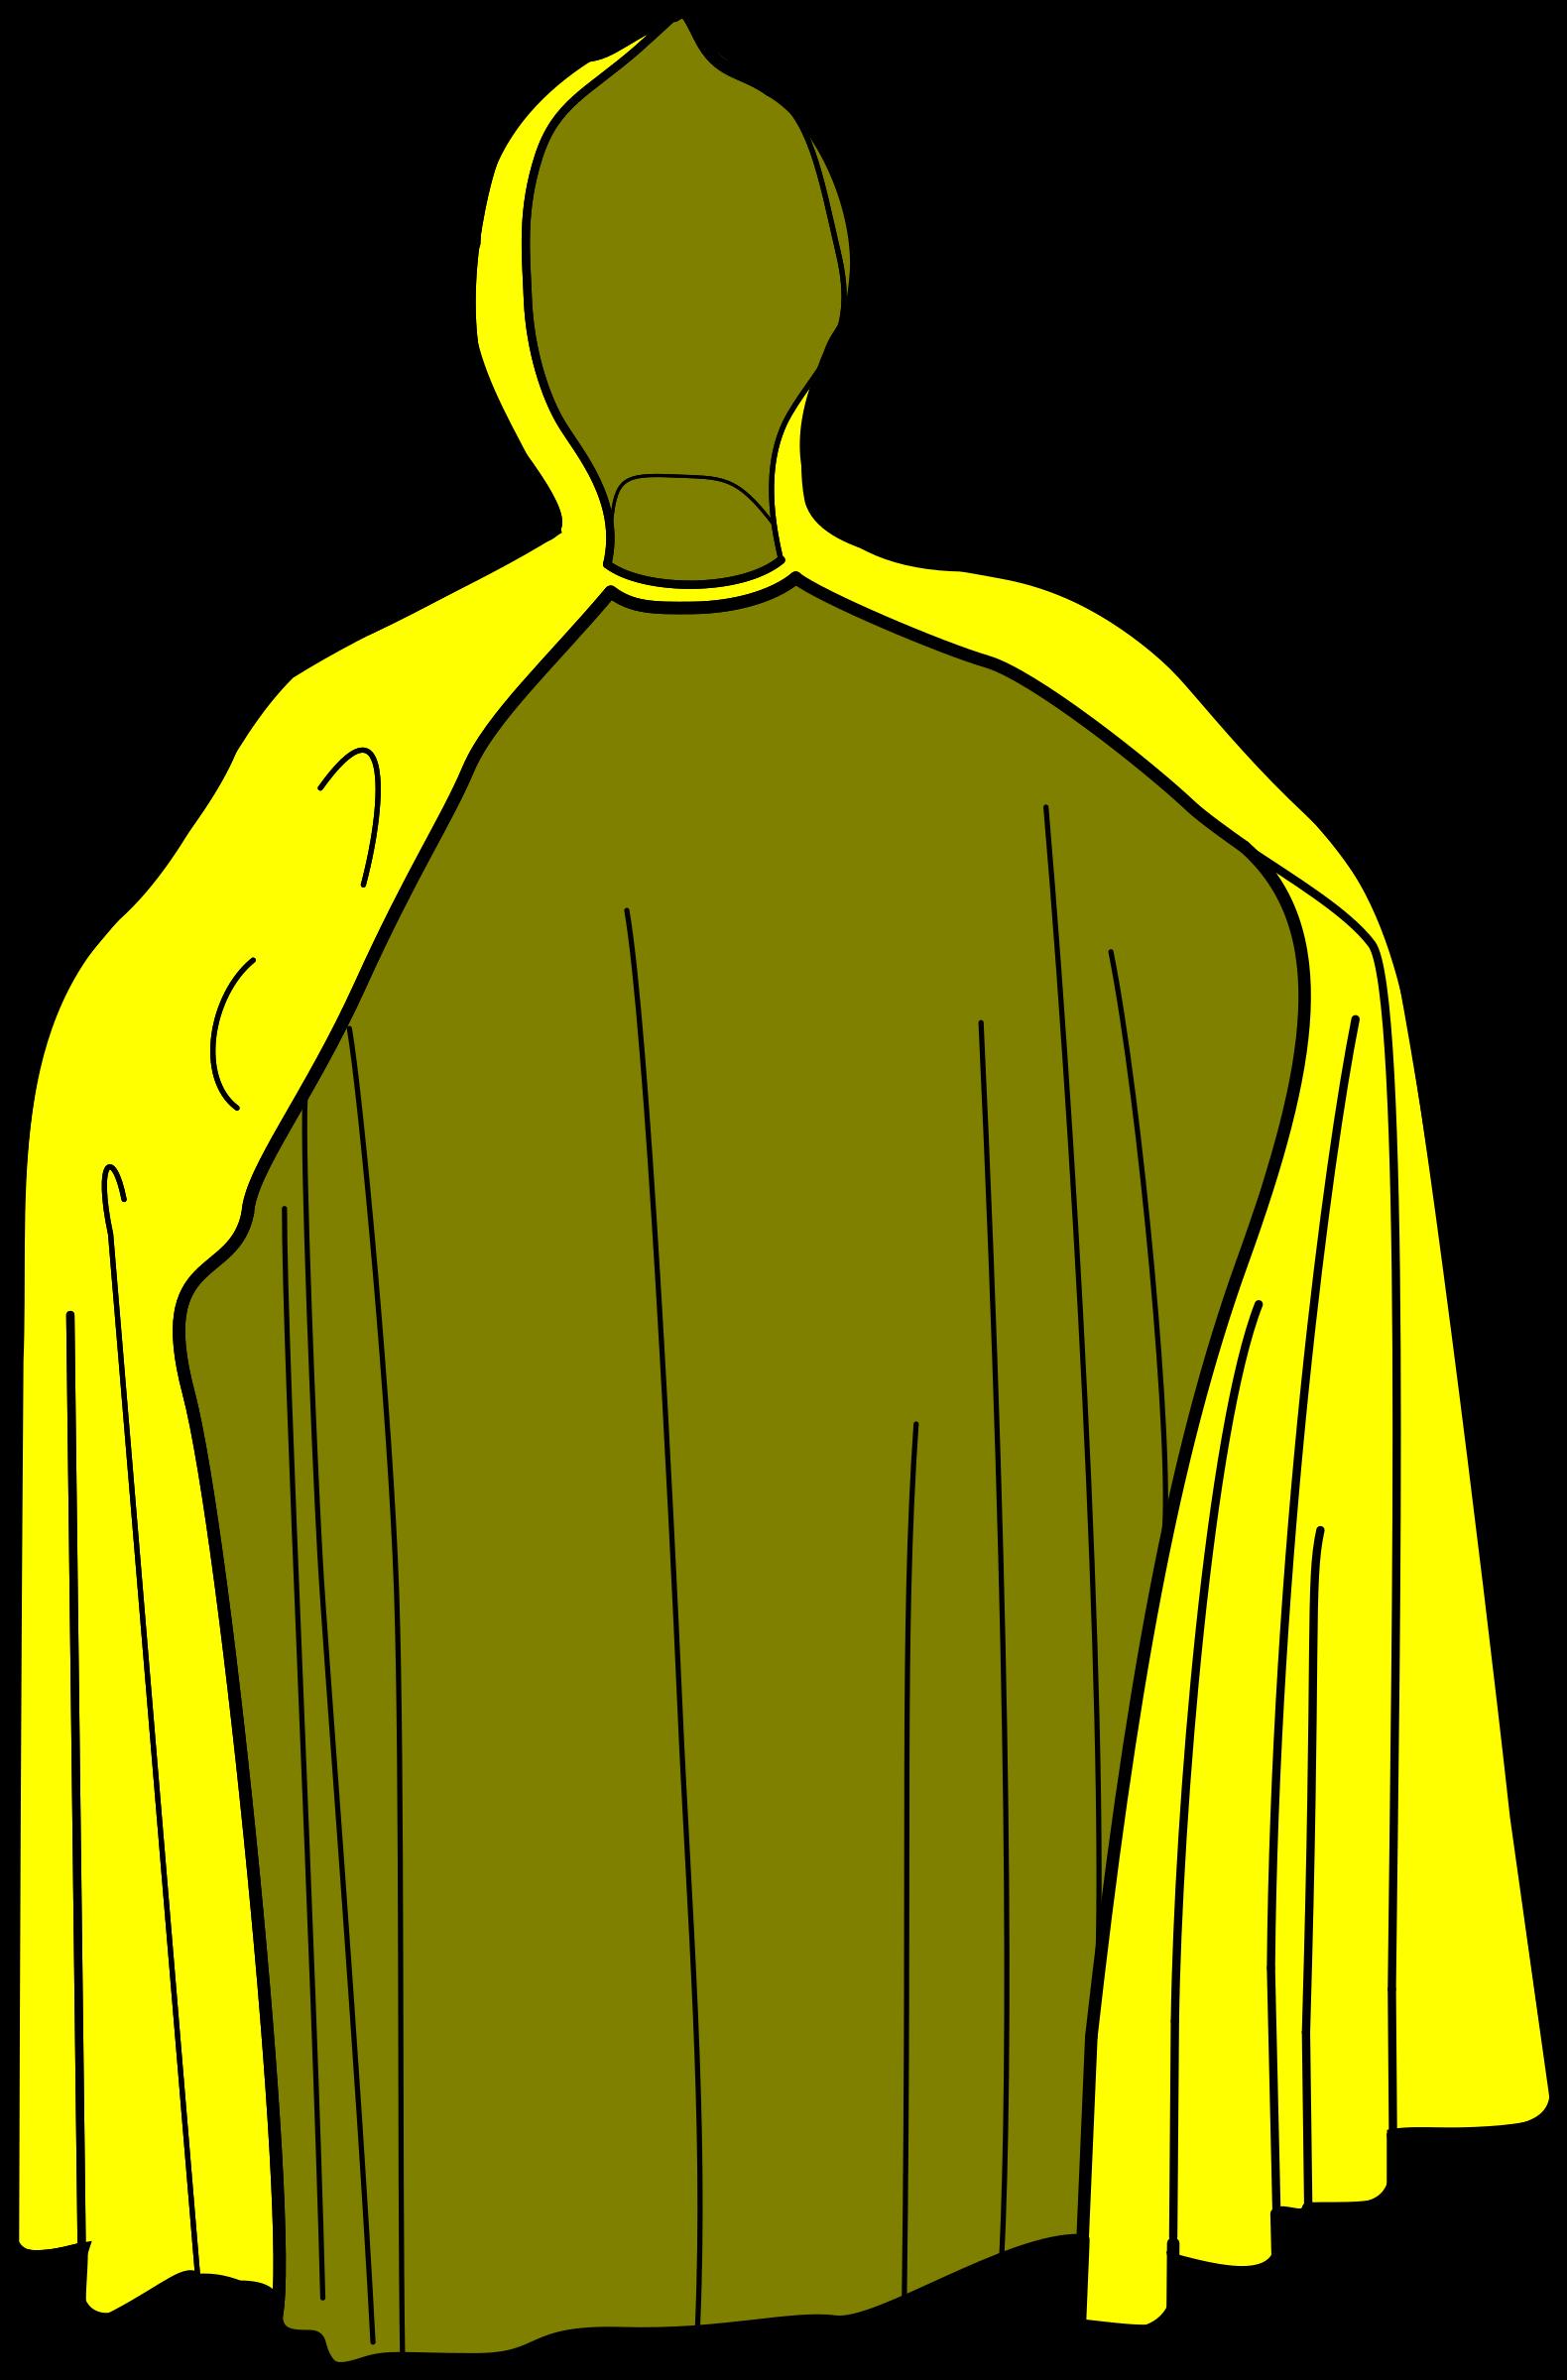 free clip art yellow jacket - photo #33